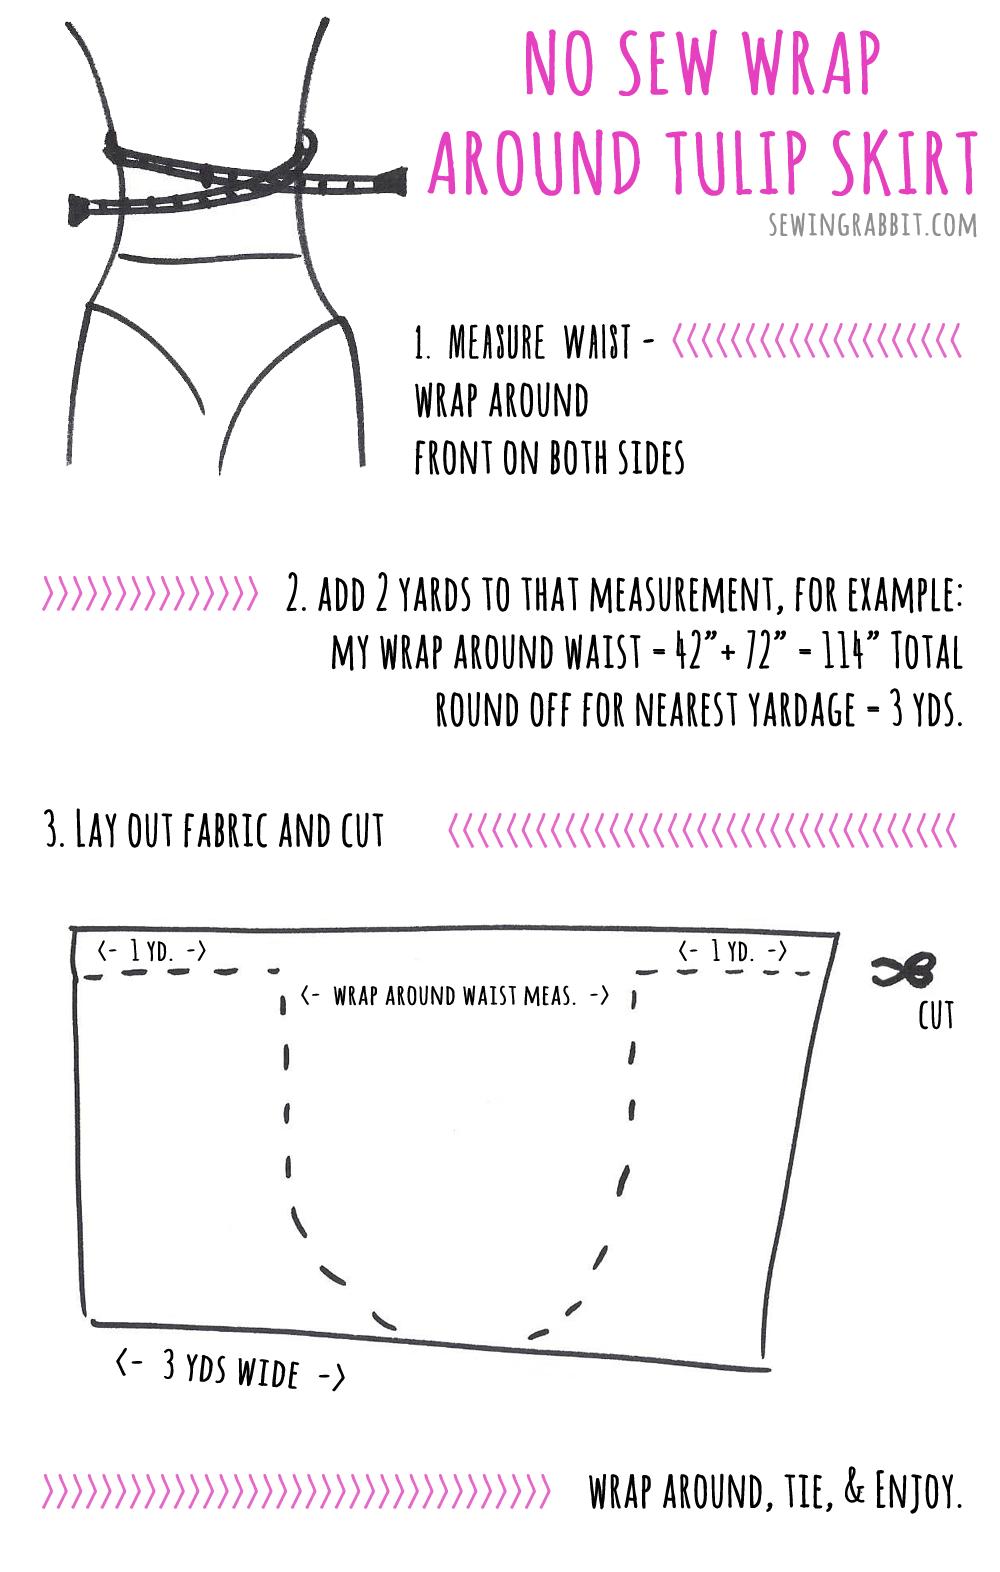 Sew Wrap Around Skirt